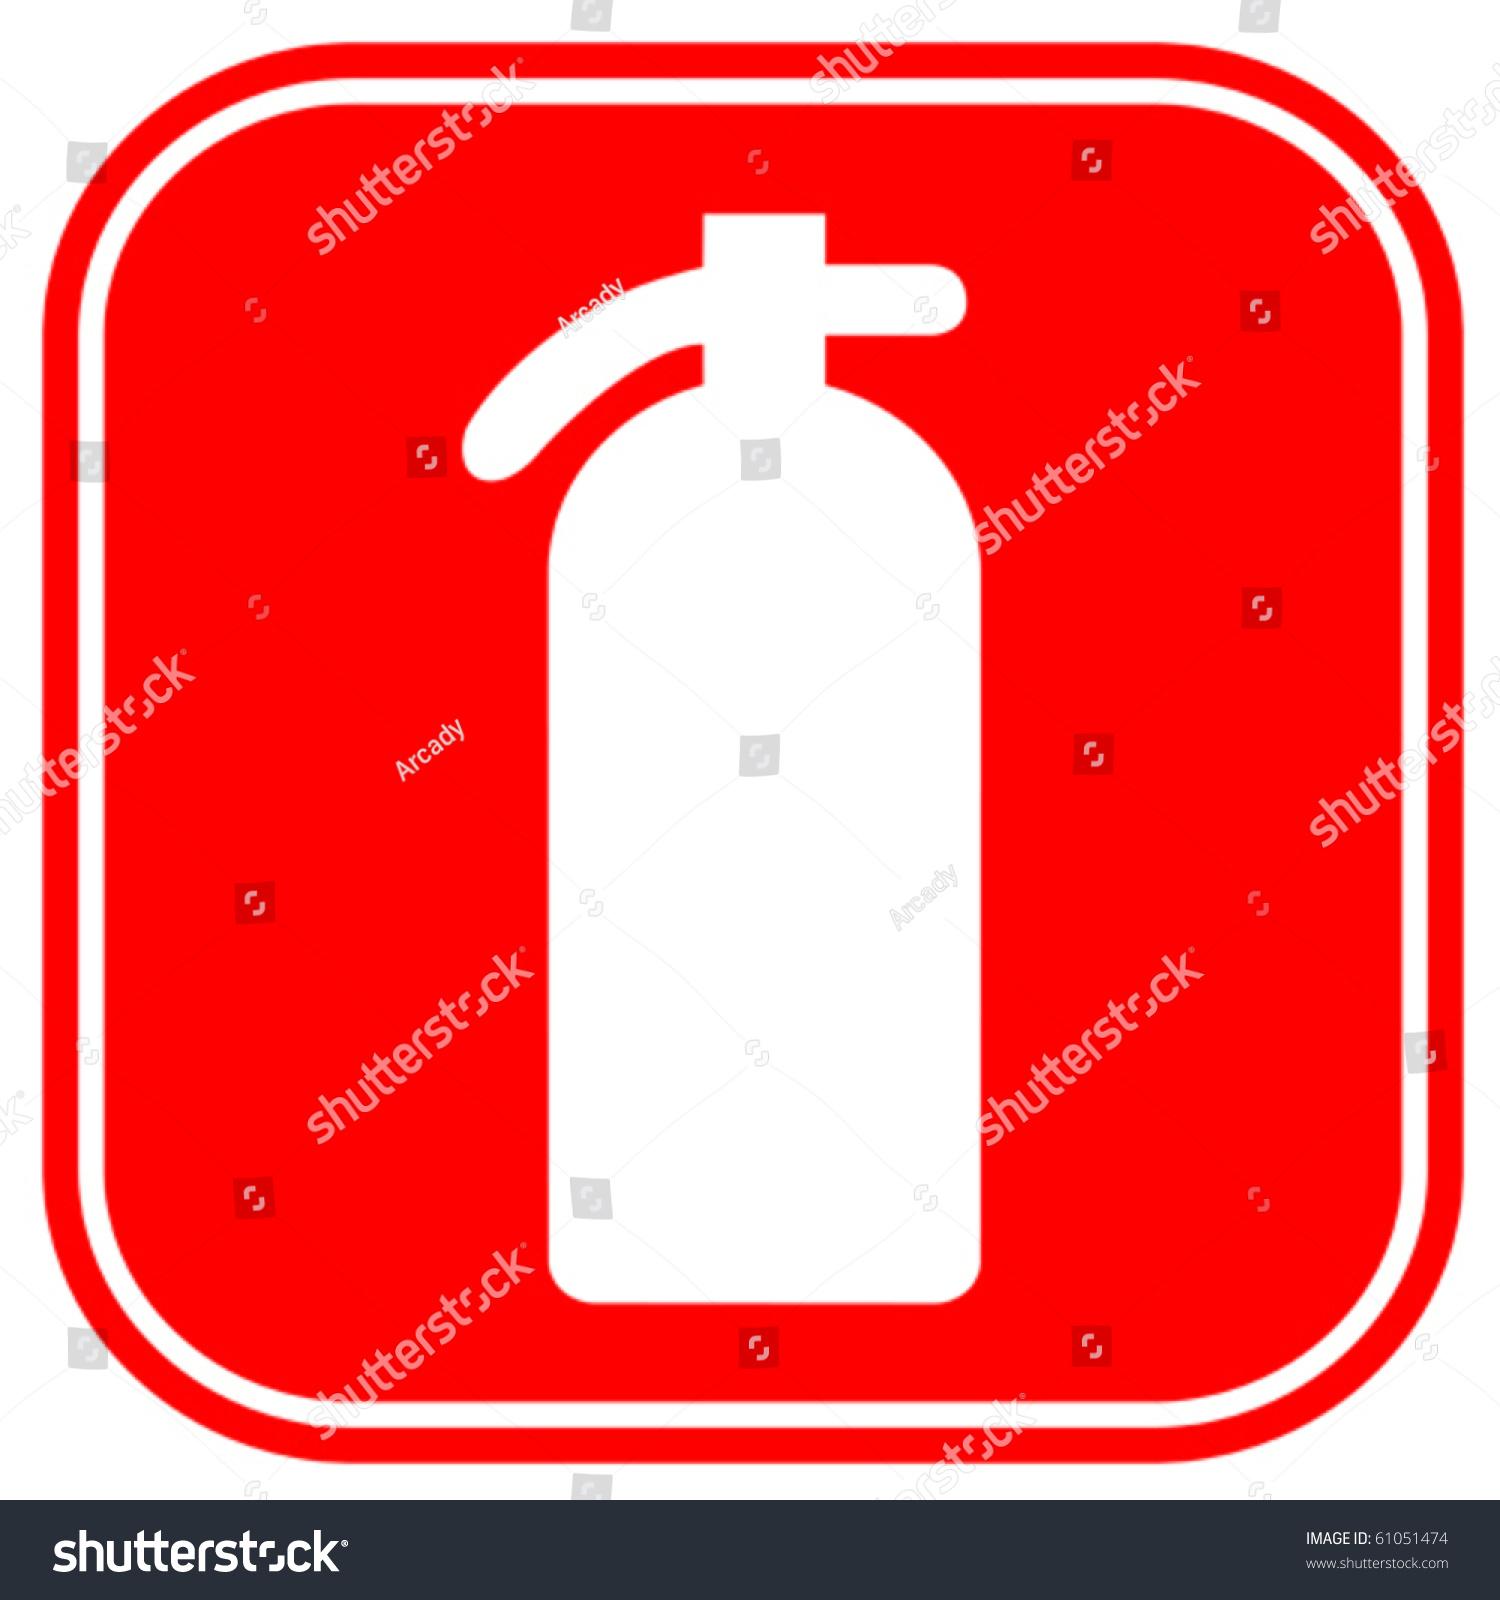 fire extinguisher sign stock vector illustration 61051474